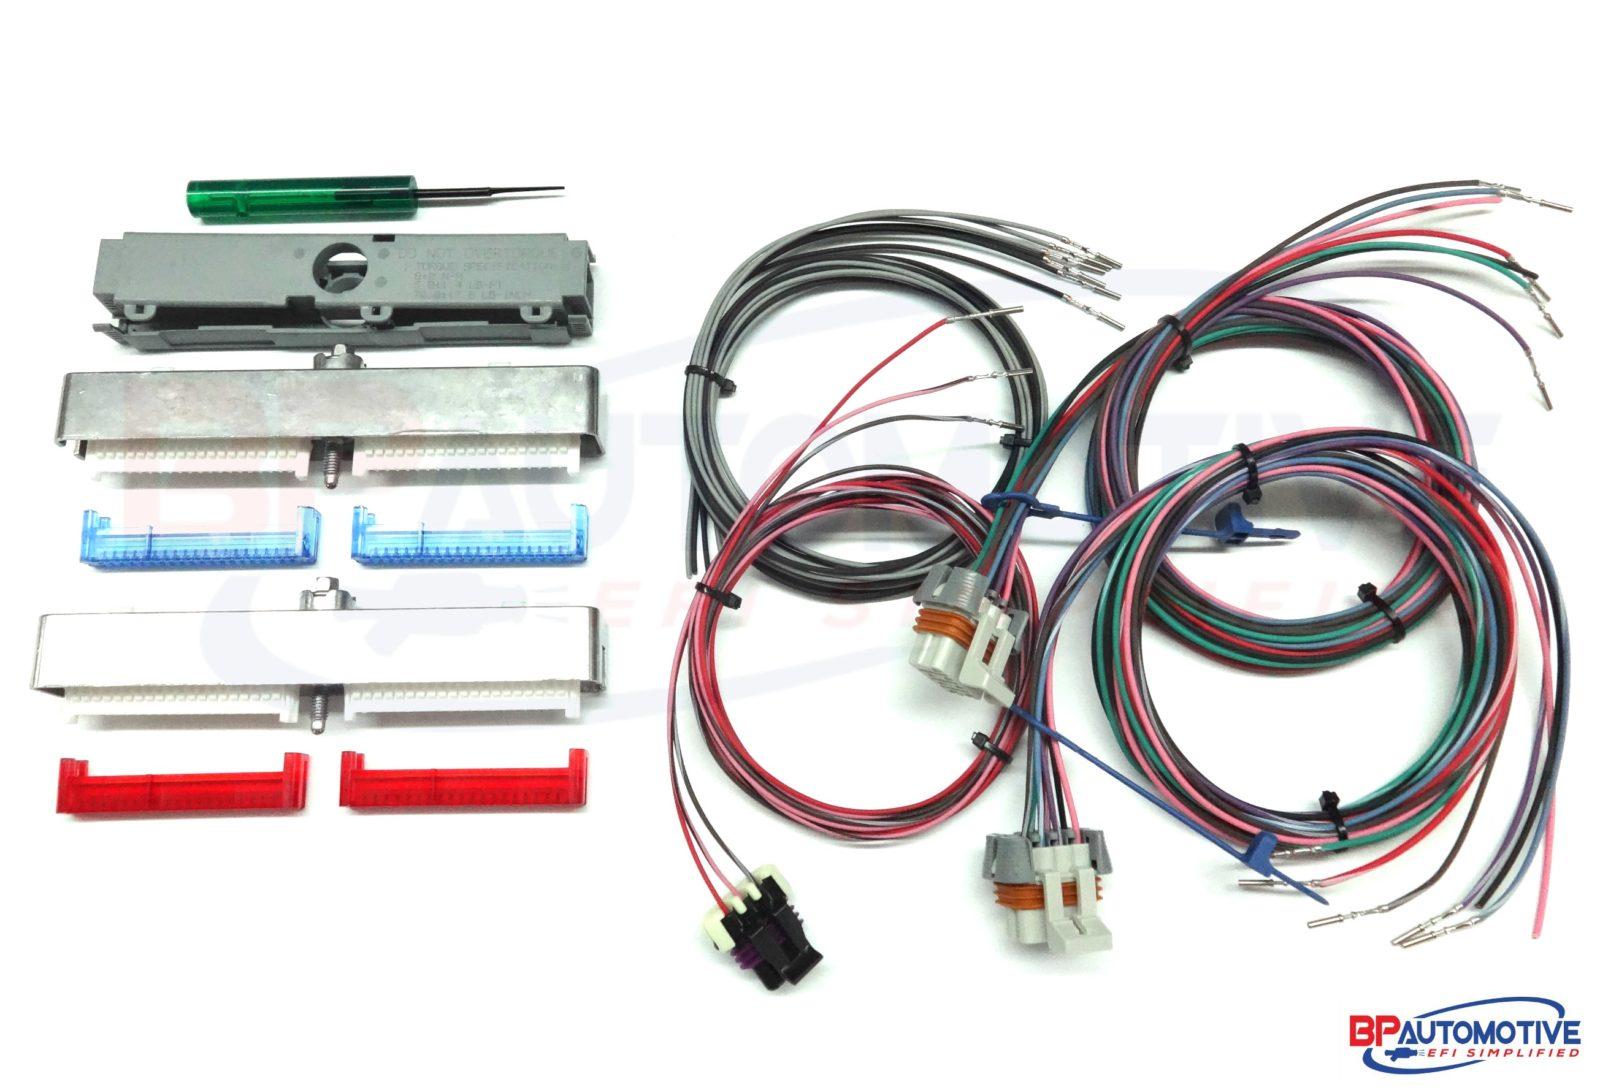 hight resolution of 1996 1997 24x conversion diy kit 24x lt1 wiring harness